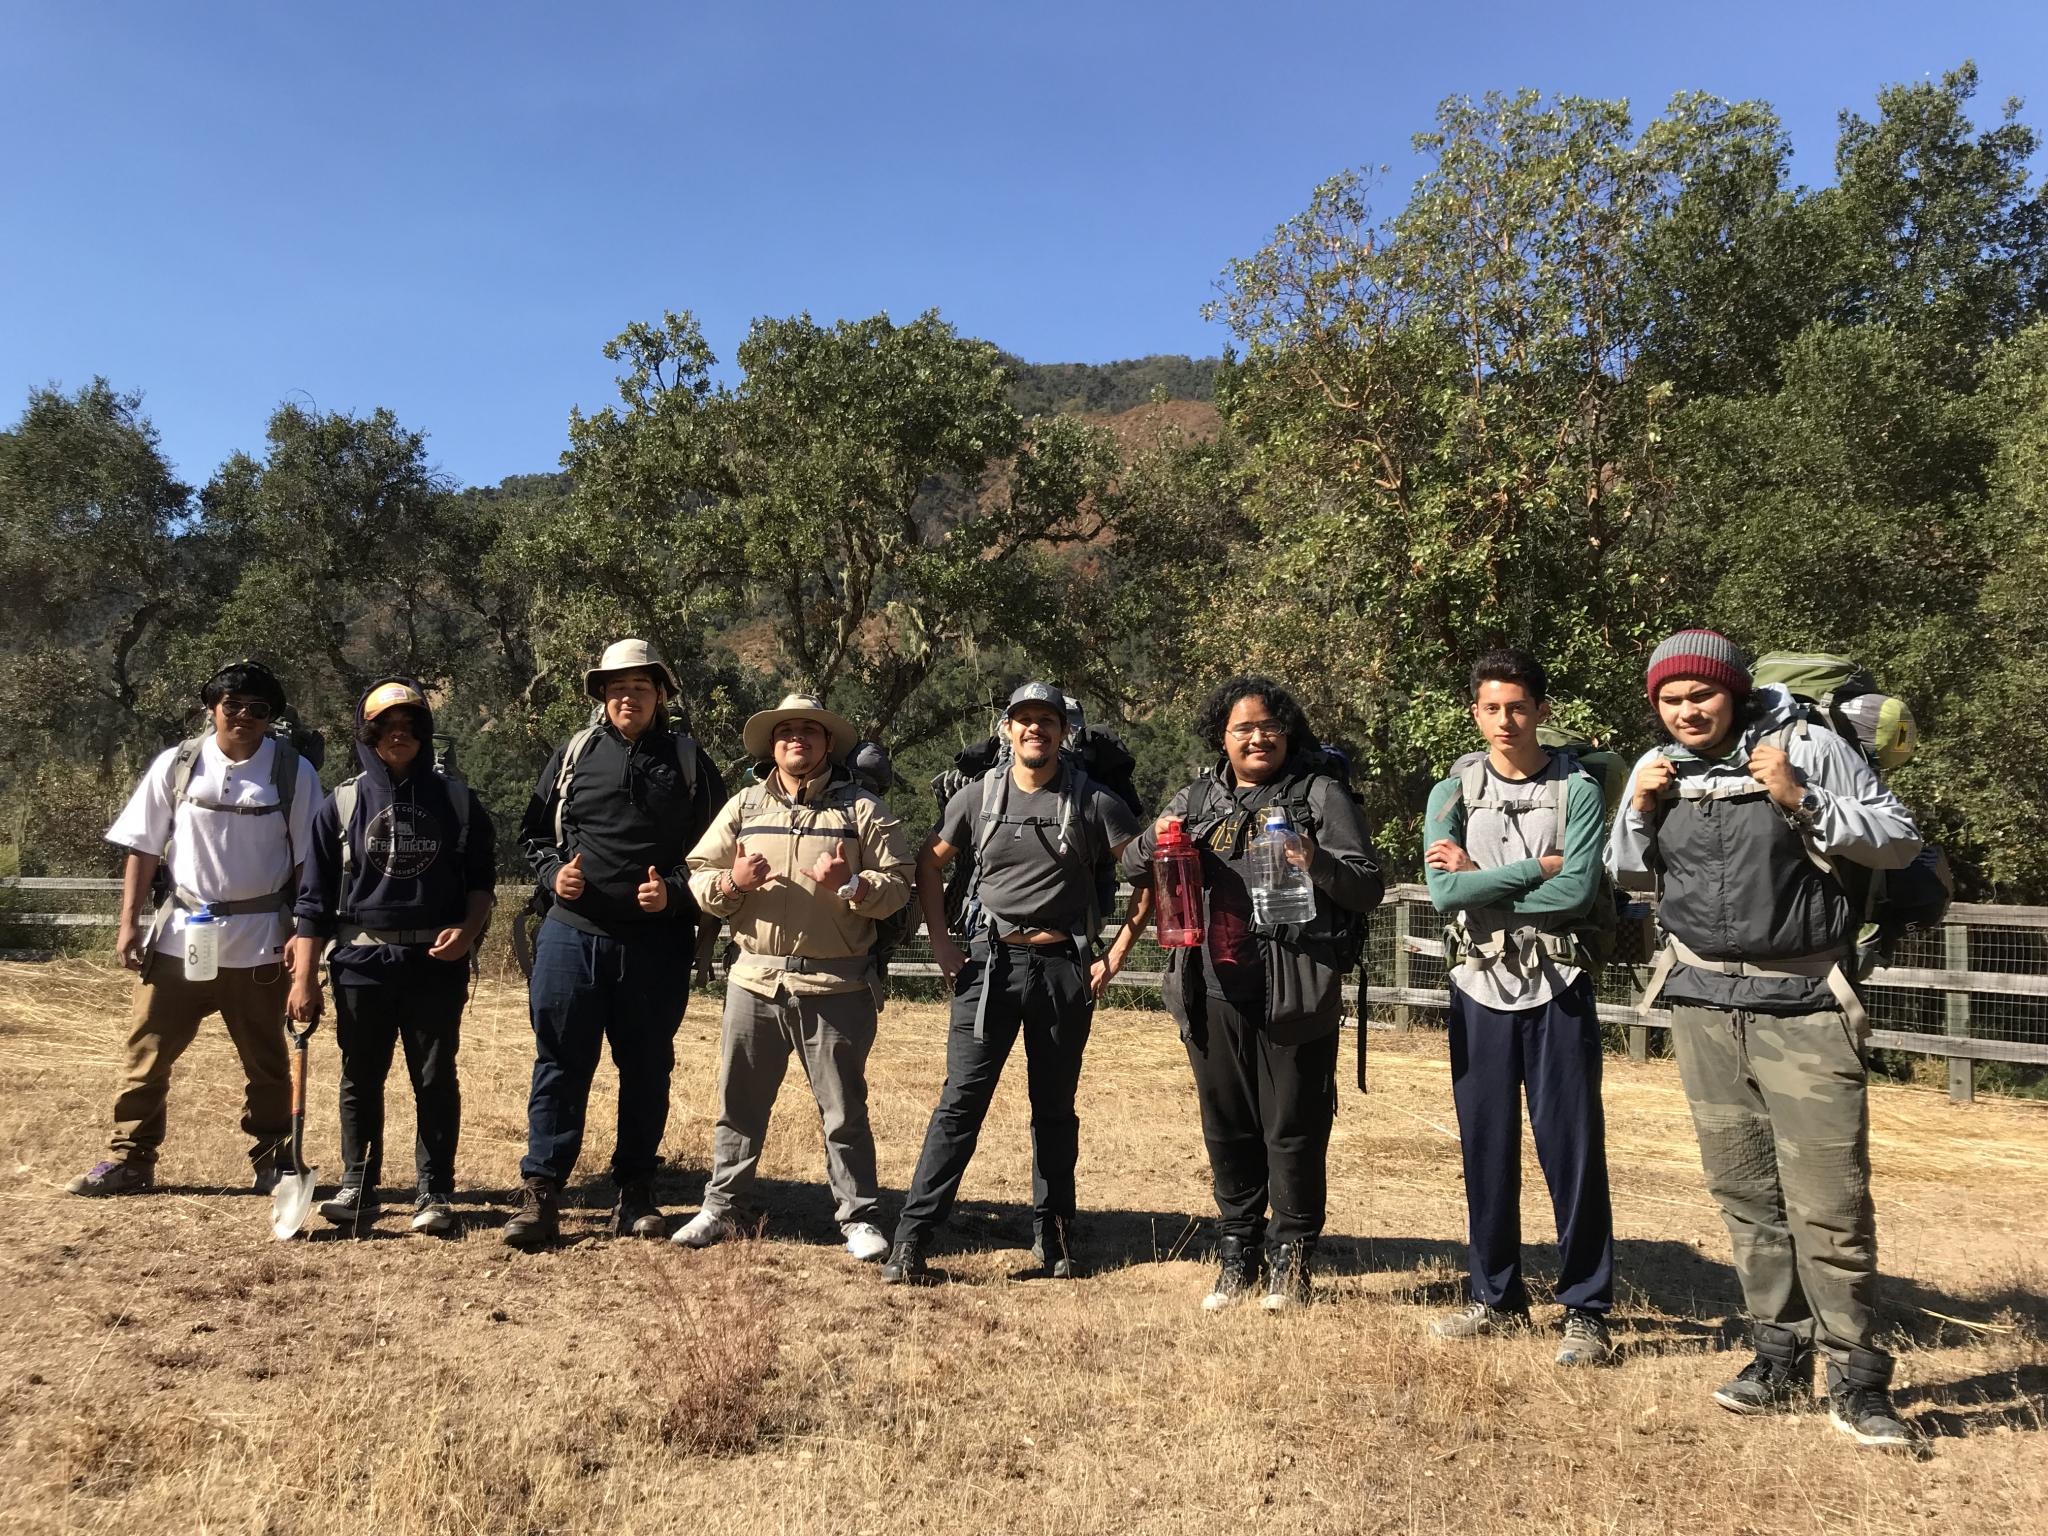 Field Trip: Backpacking Trip